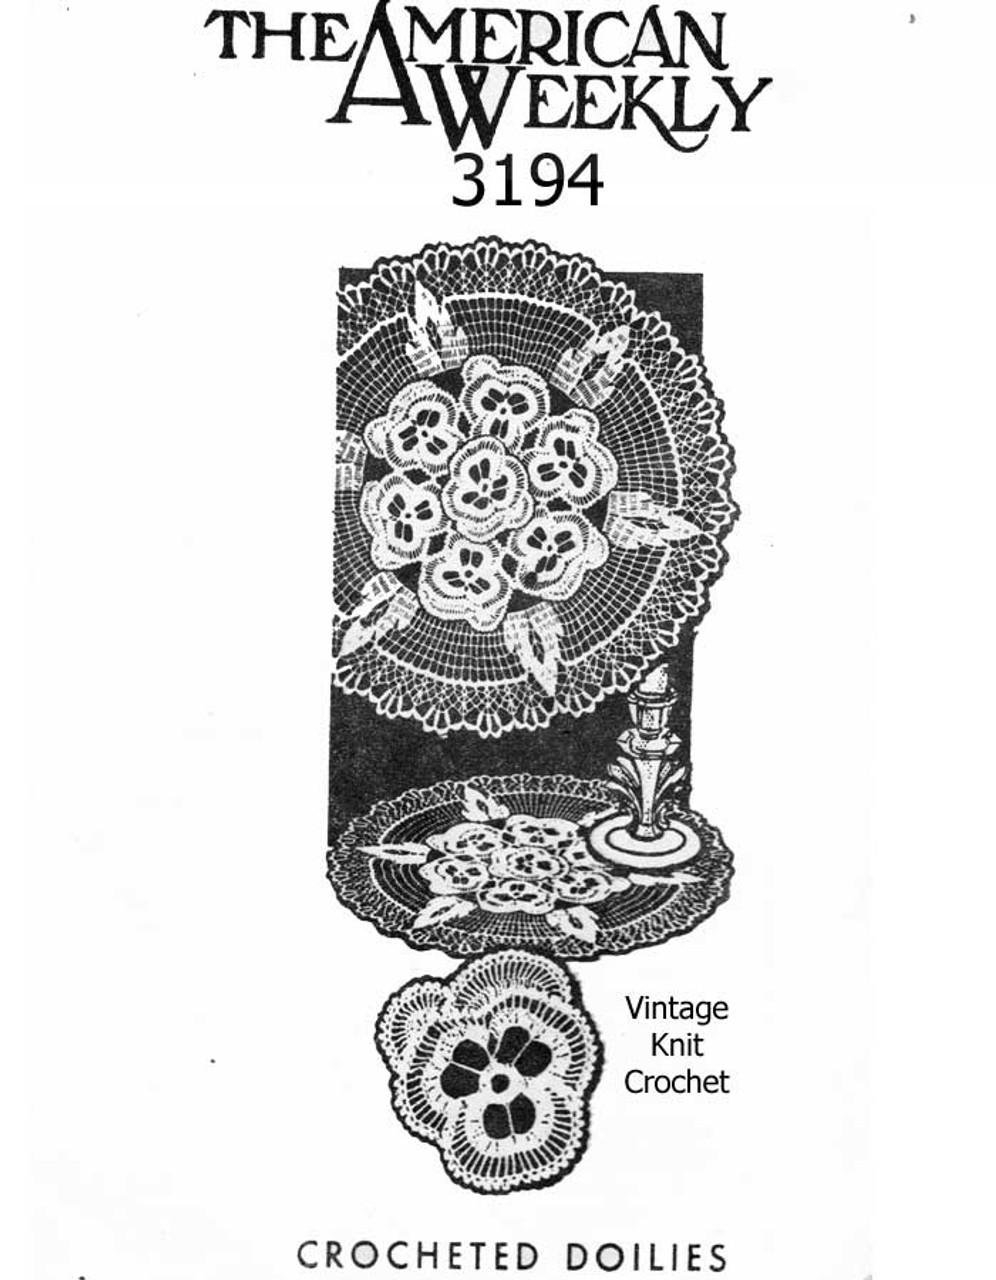 Mail Order Crochet Pansy Doily Pattern Design 3194